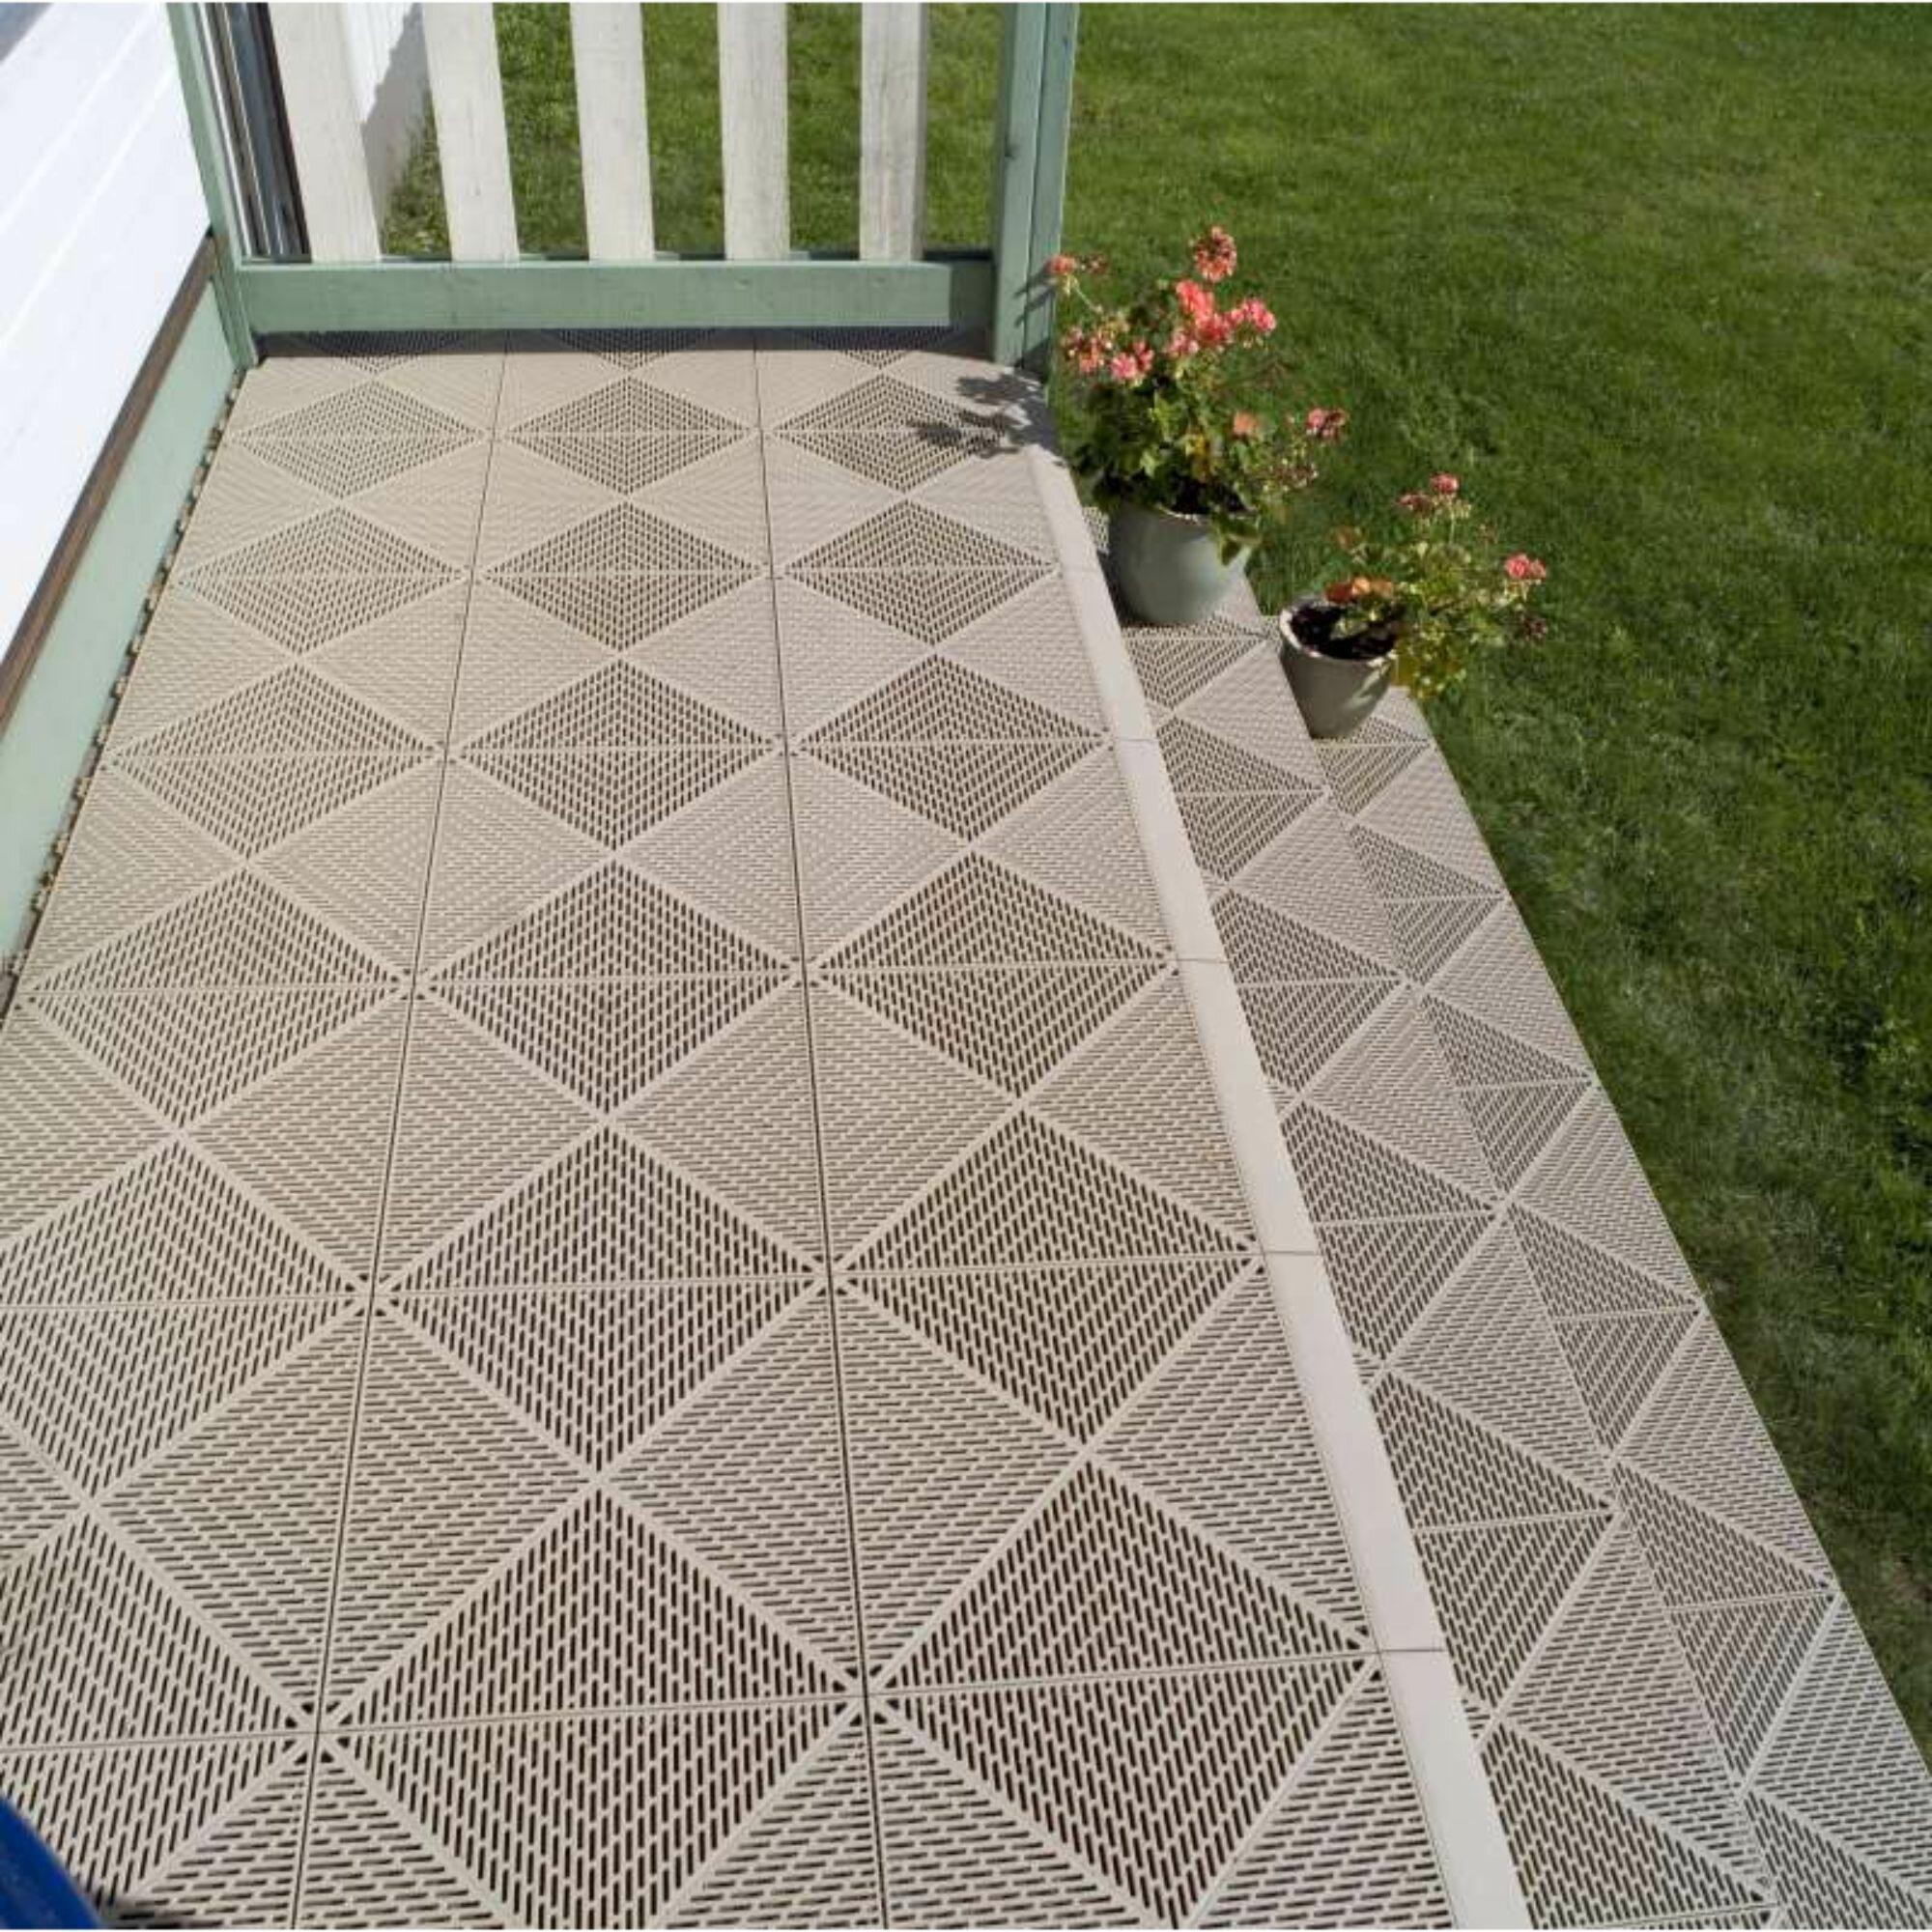 Mats Inc Bergo Unique 14 9 X 14 9 Garage Flooring Drain Tiles Wayfair